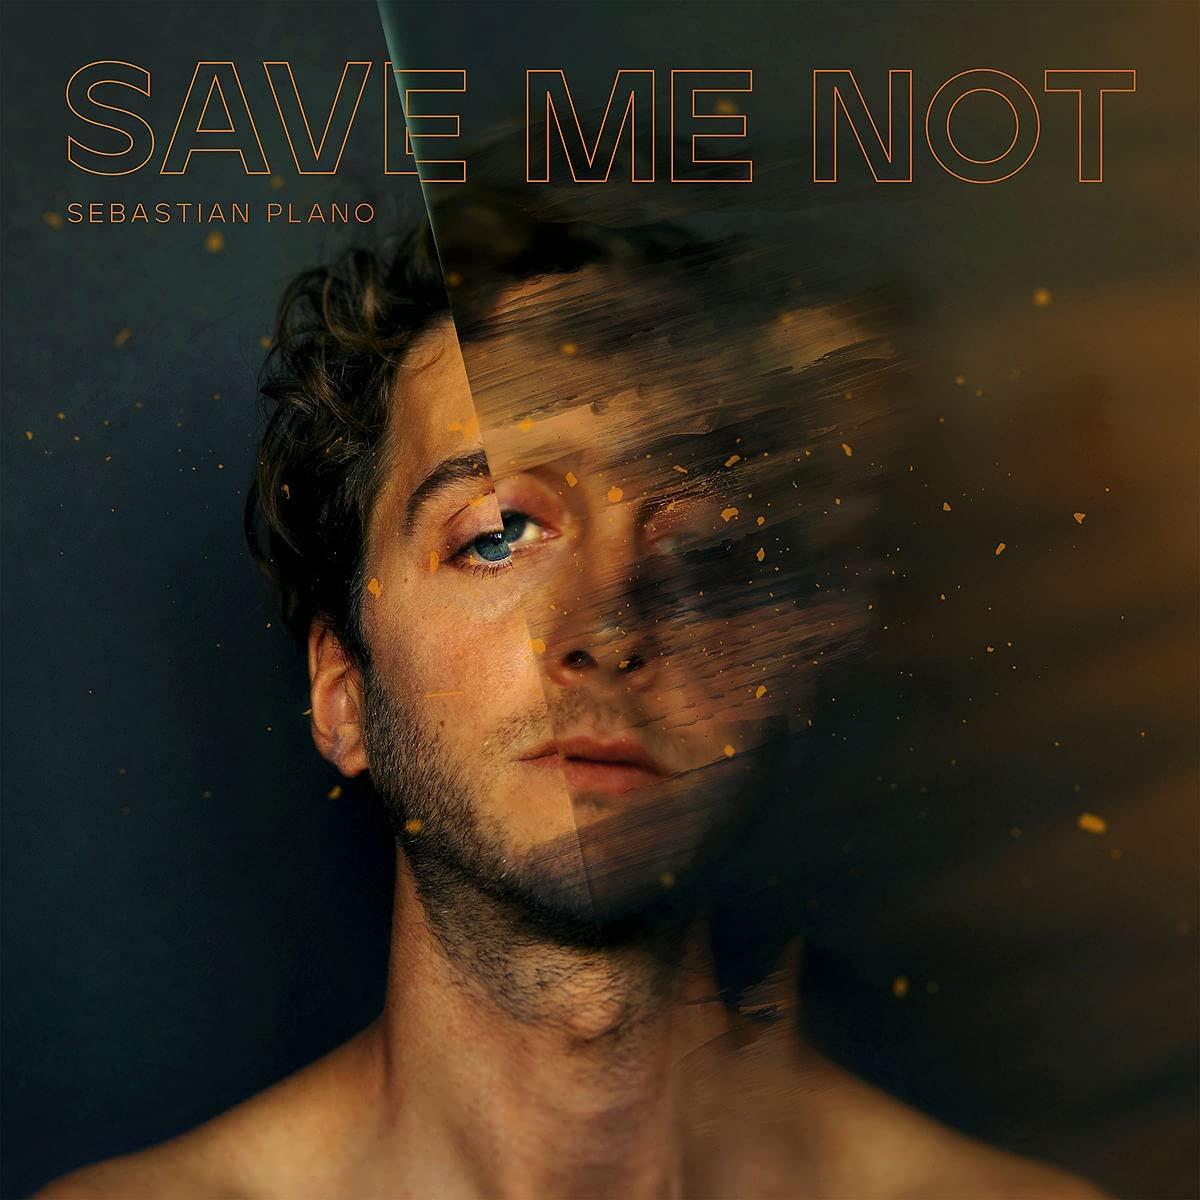 Save Me Not (Vinyl) - Sebastian Plano